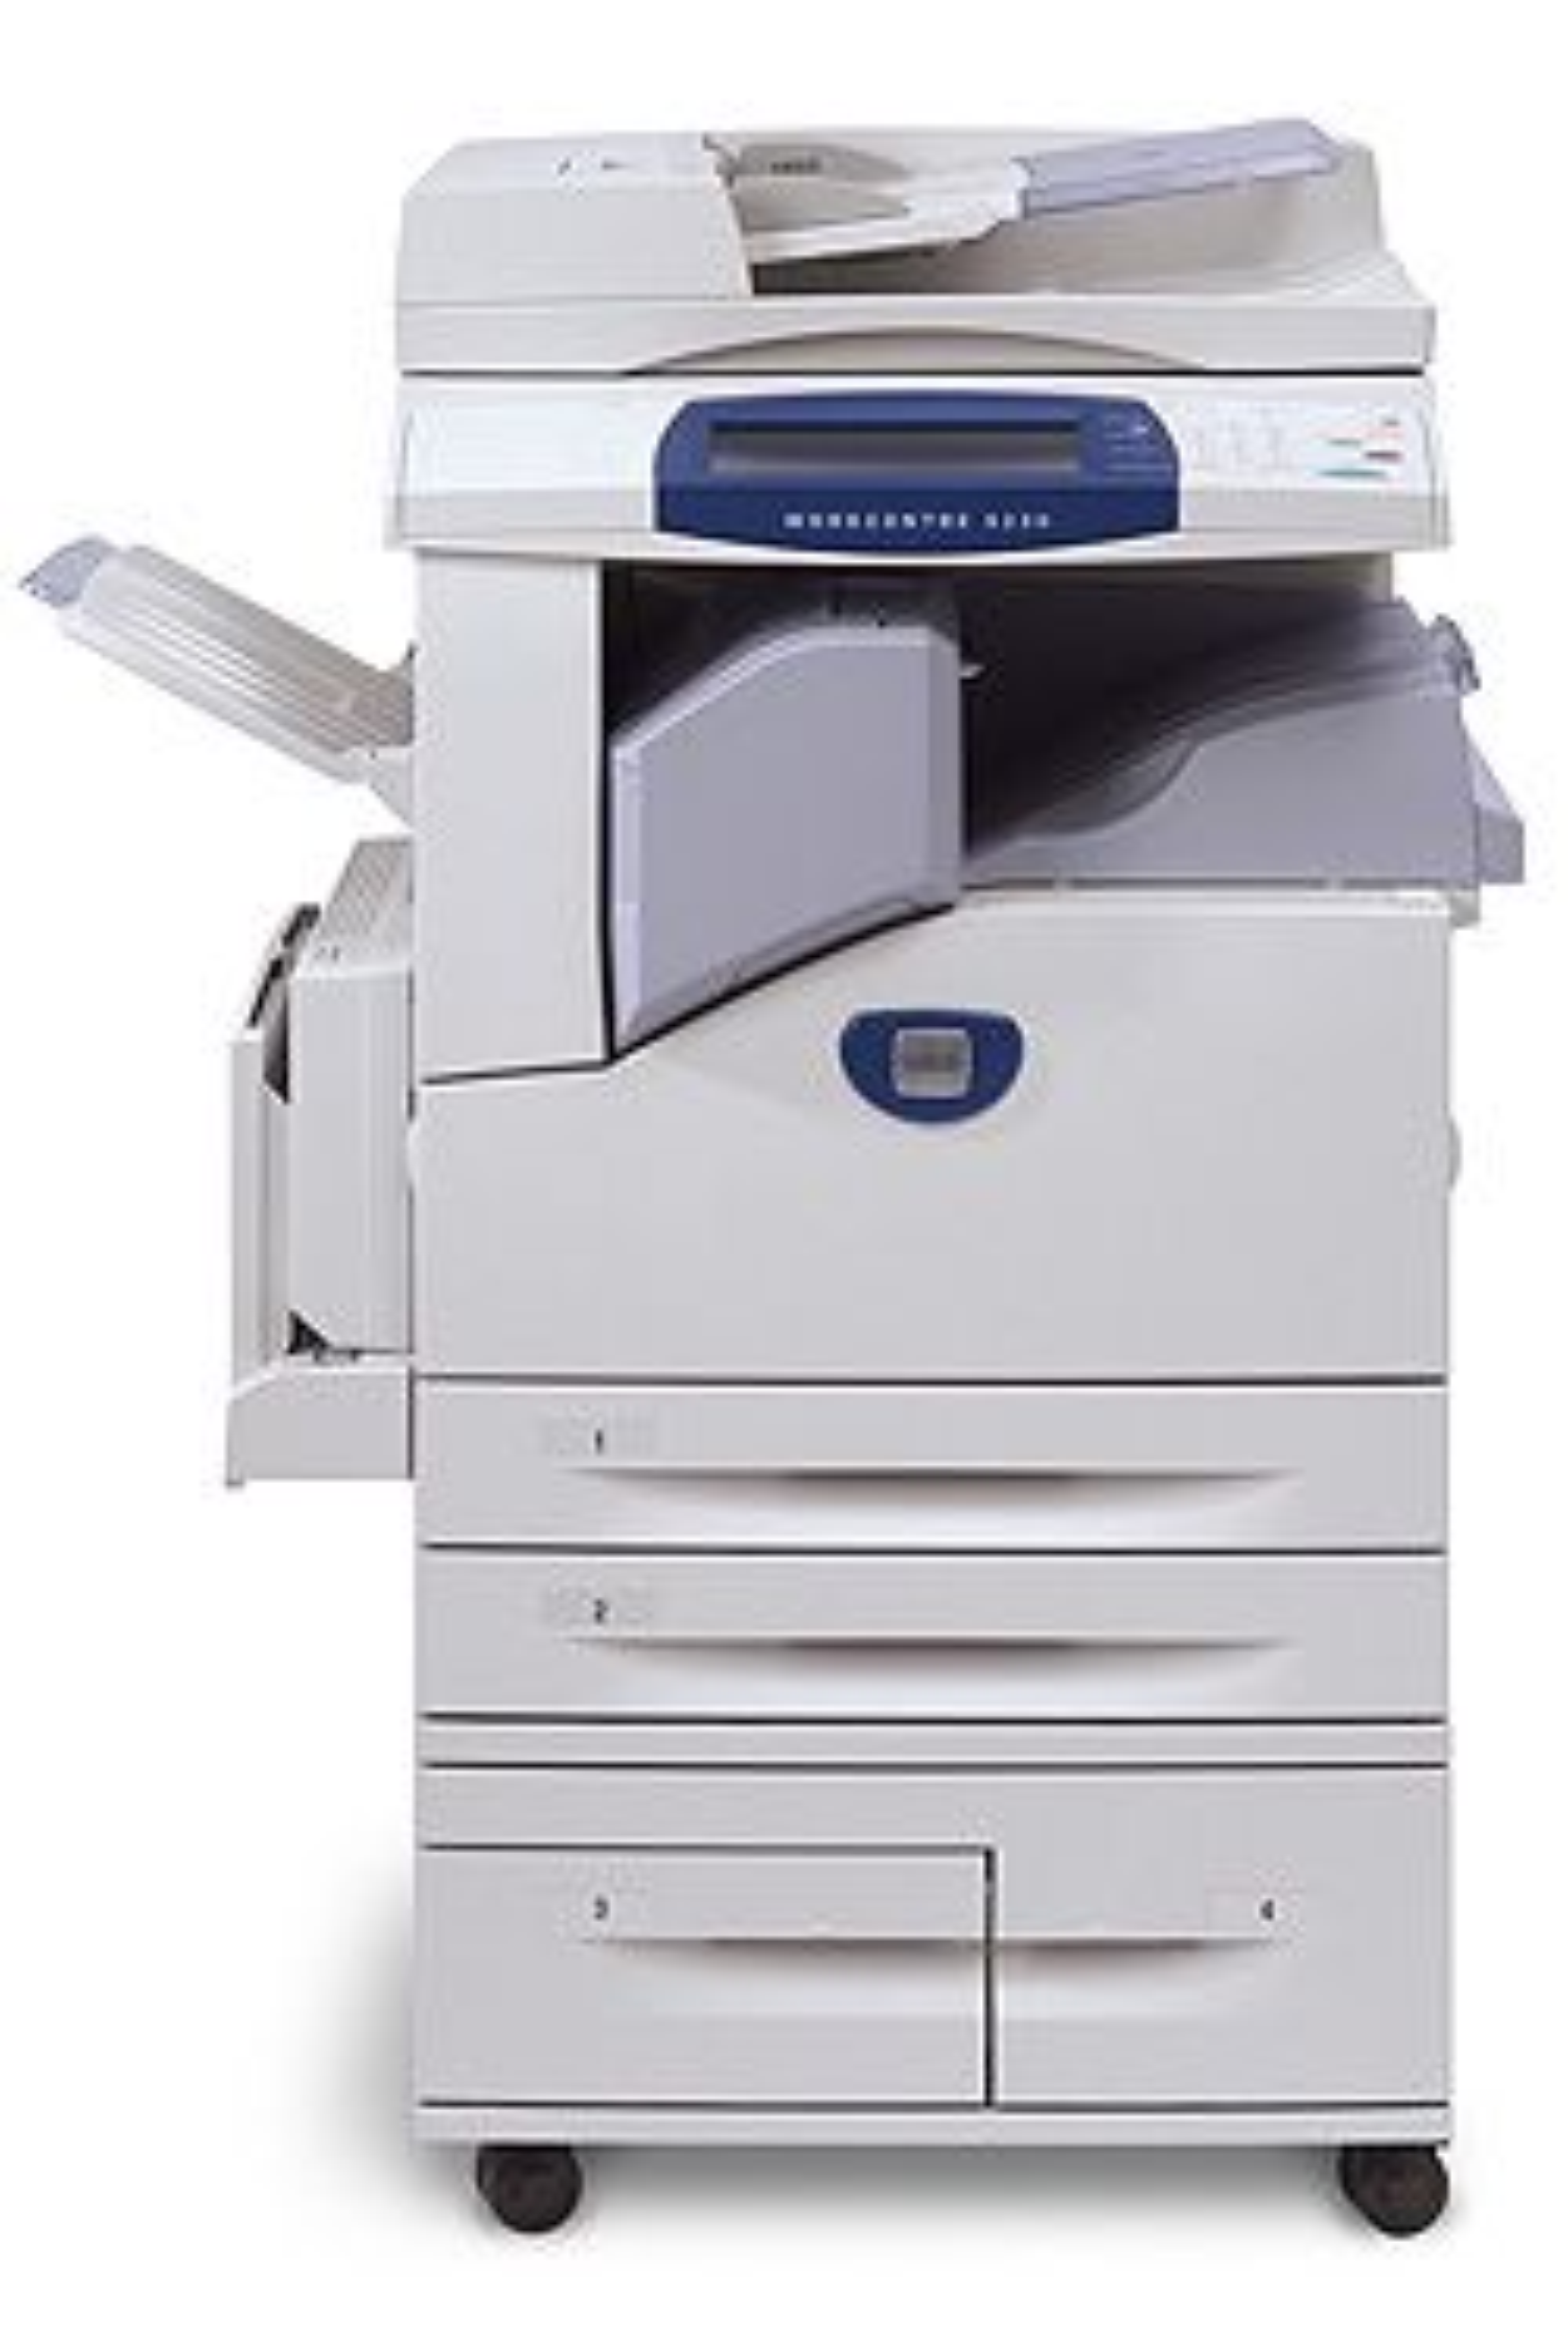 Xerox' nye toppmodell, Workcentre 5225/5230. (Foto: Xerox)